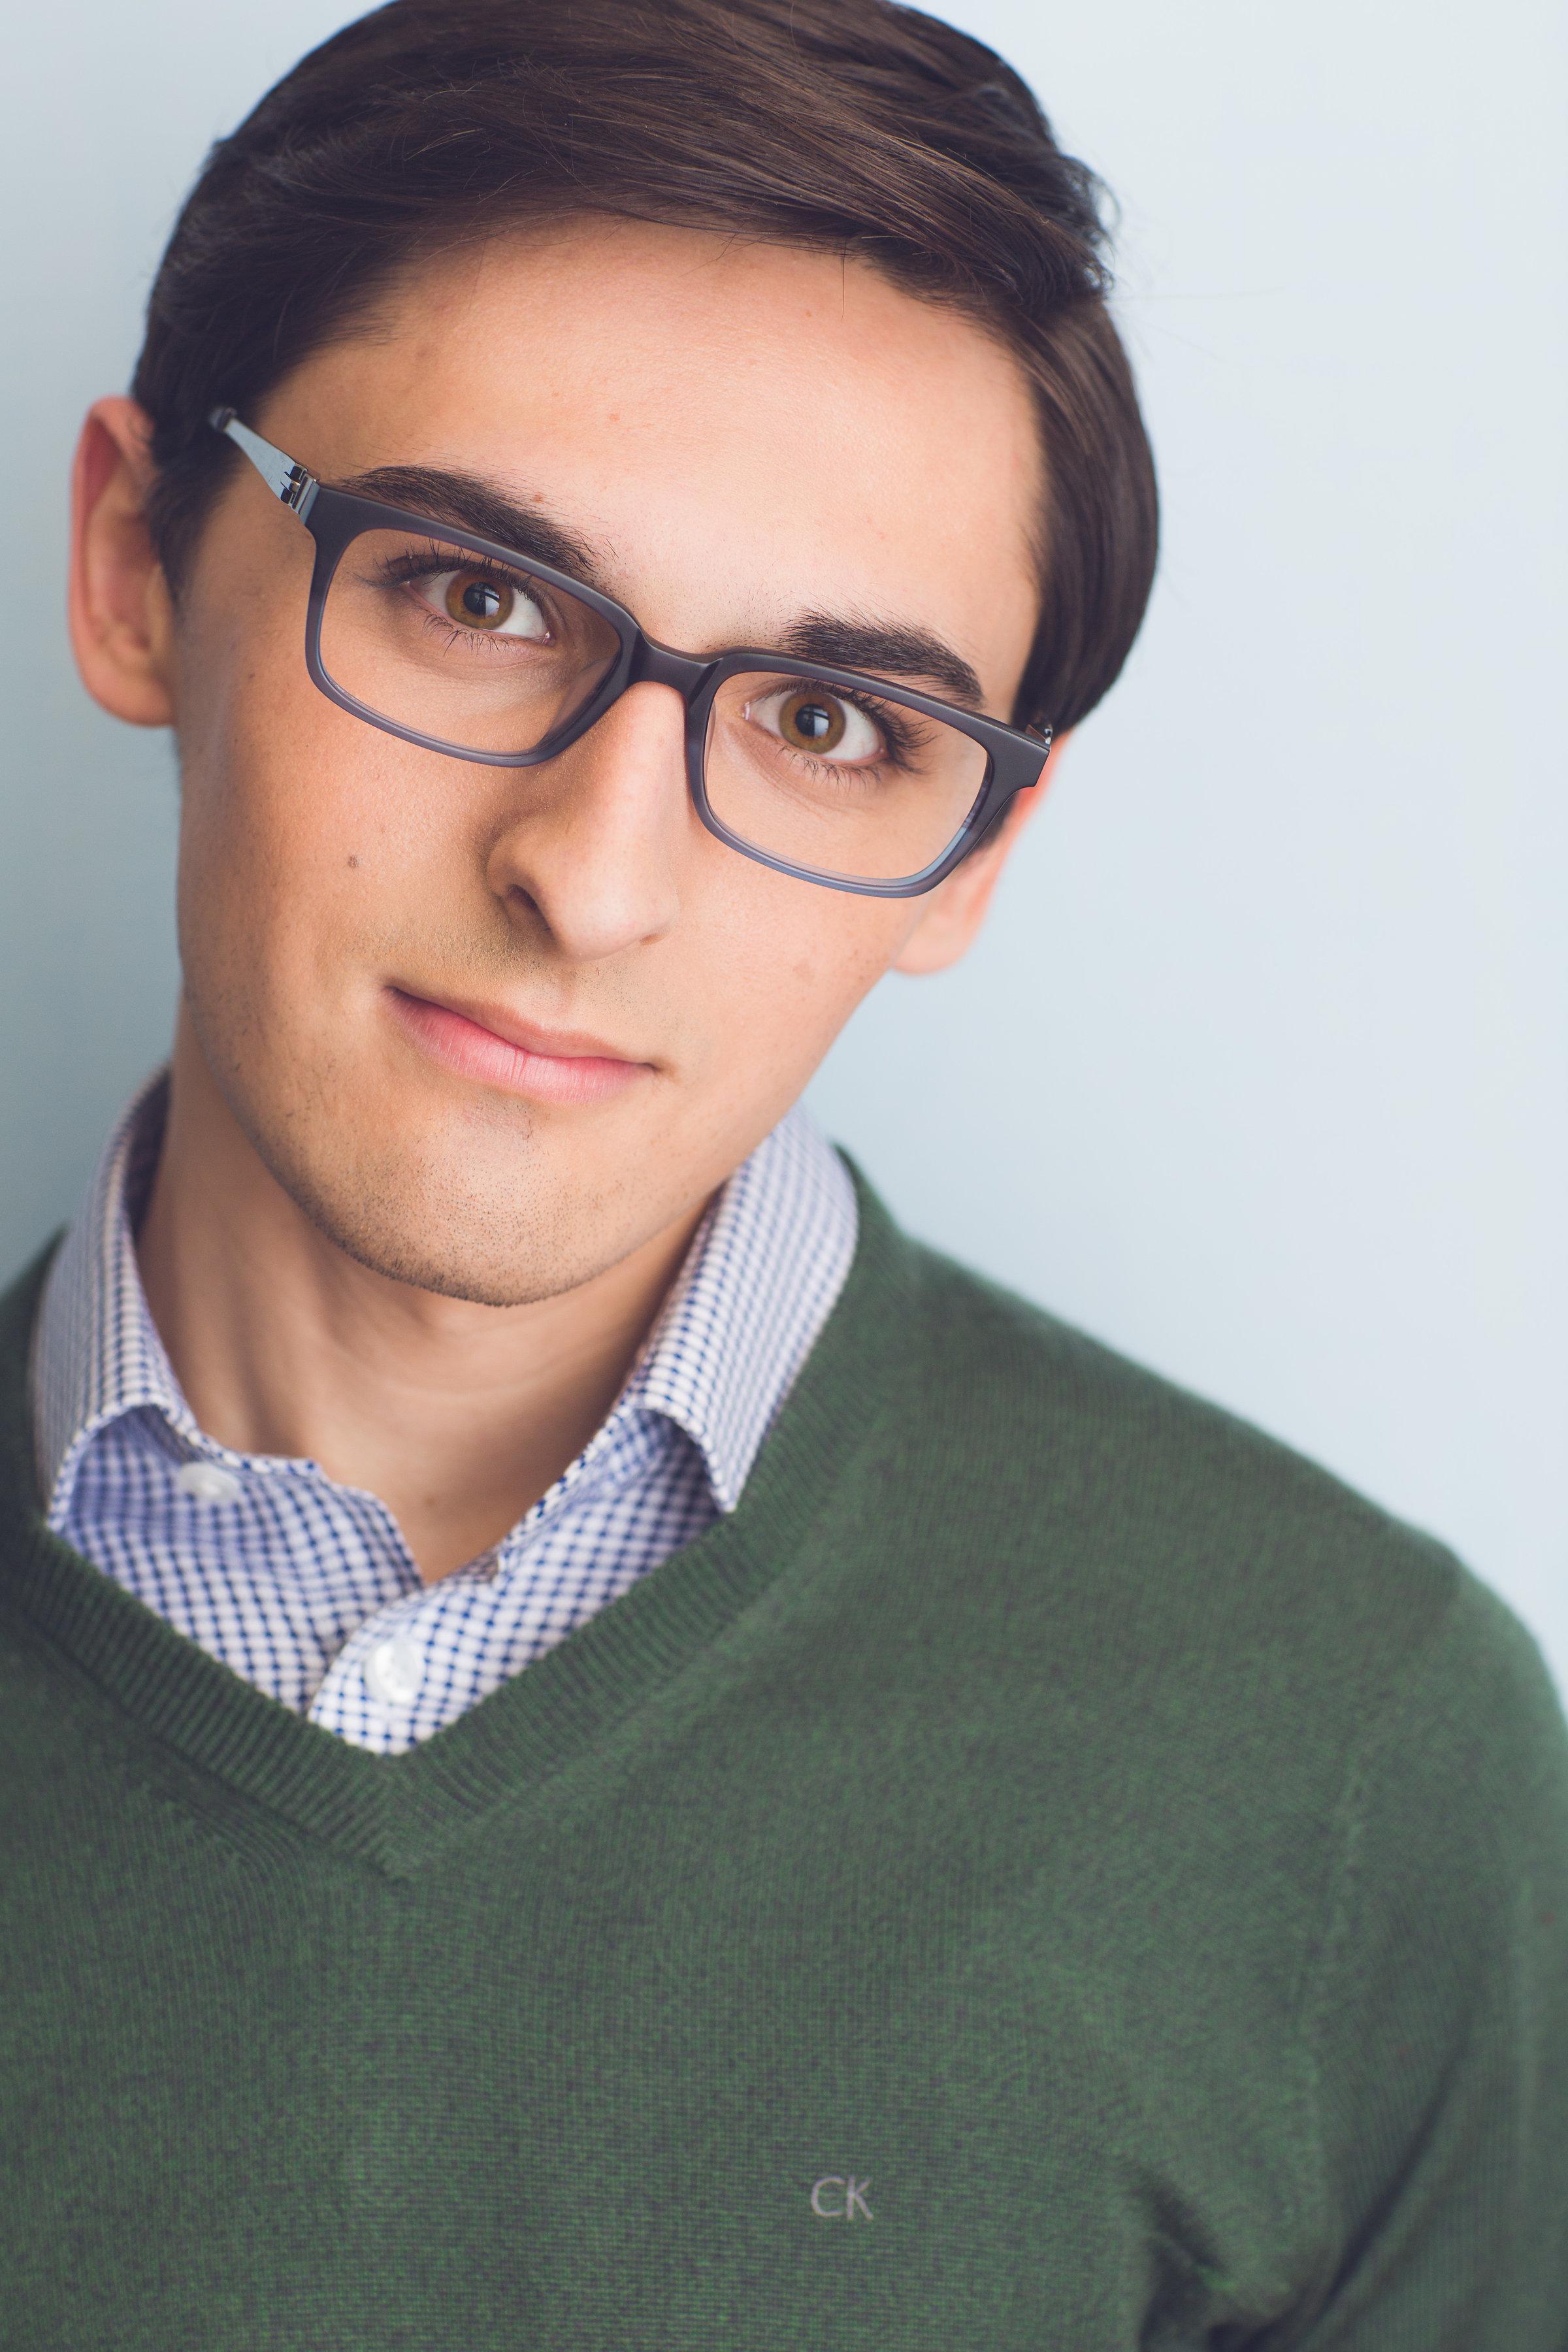 Bradley Levine